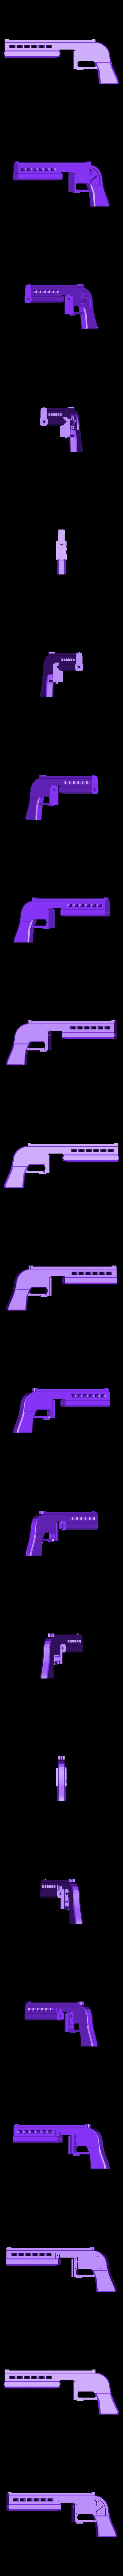 Flame  8inch.stl Download STL file Pack 2 Magnum cal.38 and 22 short and long • 3D print design, Kraken1983